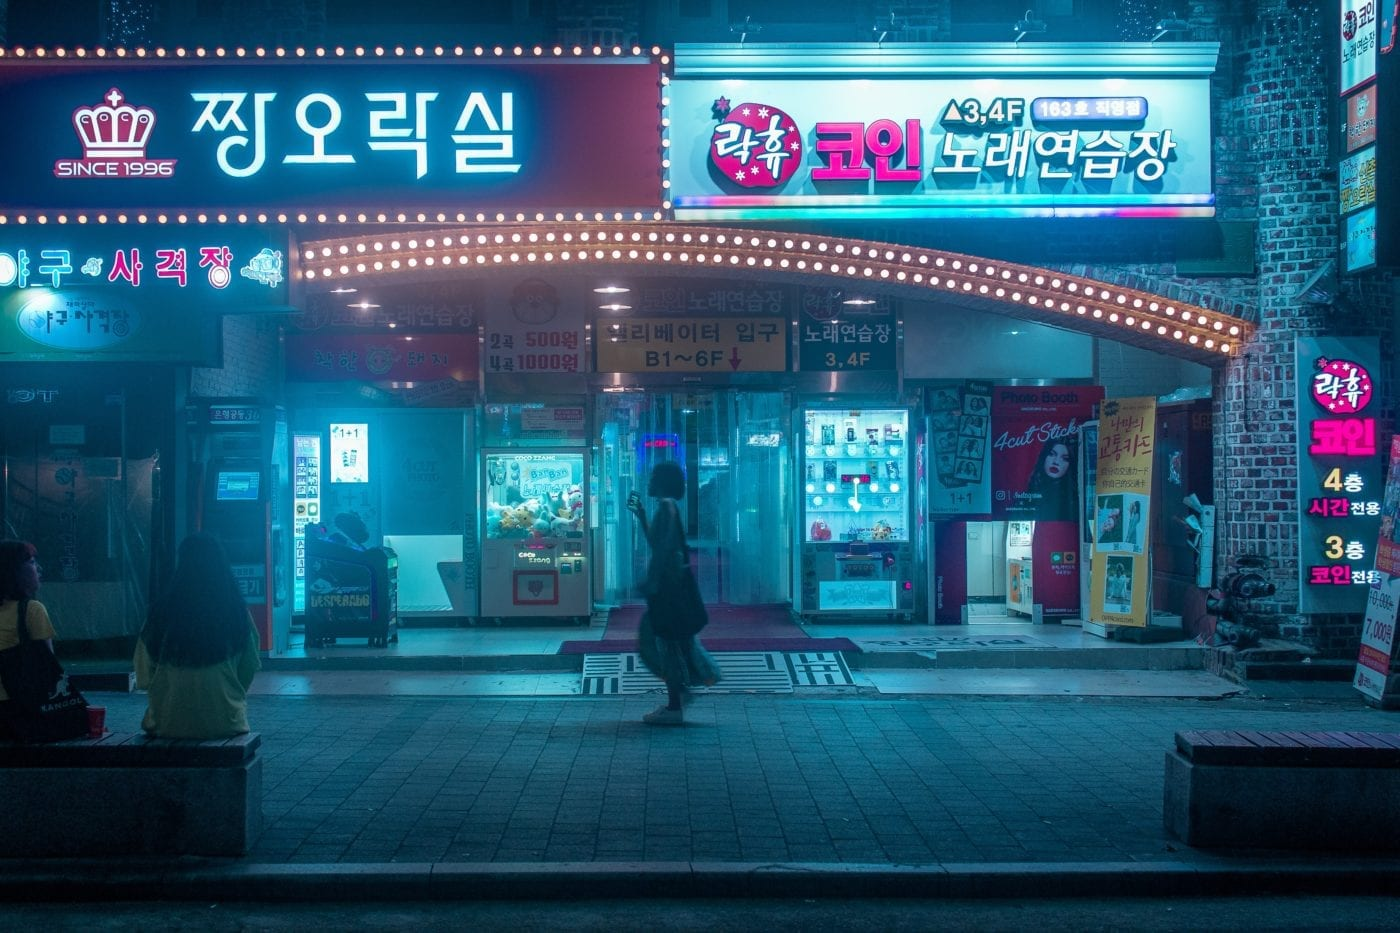 seoul night lights